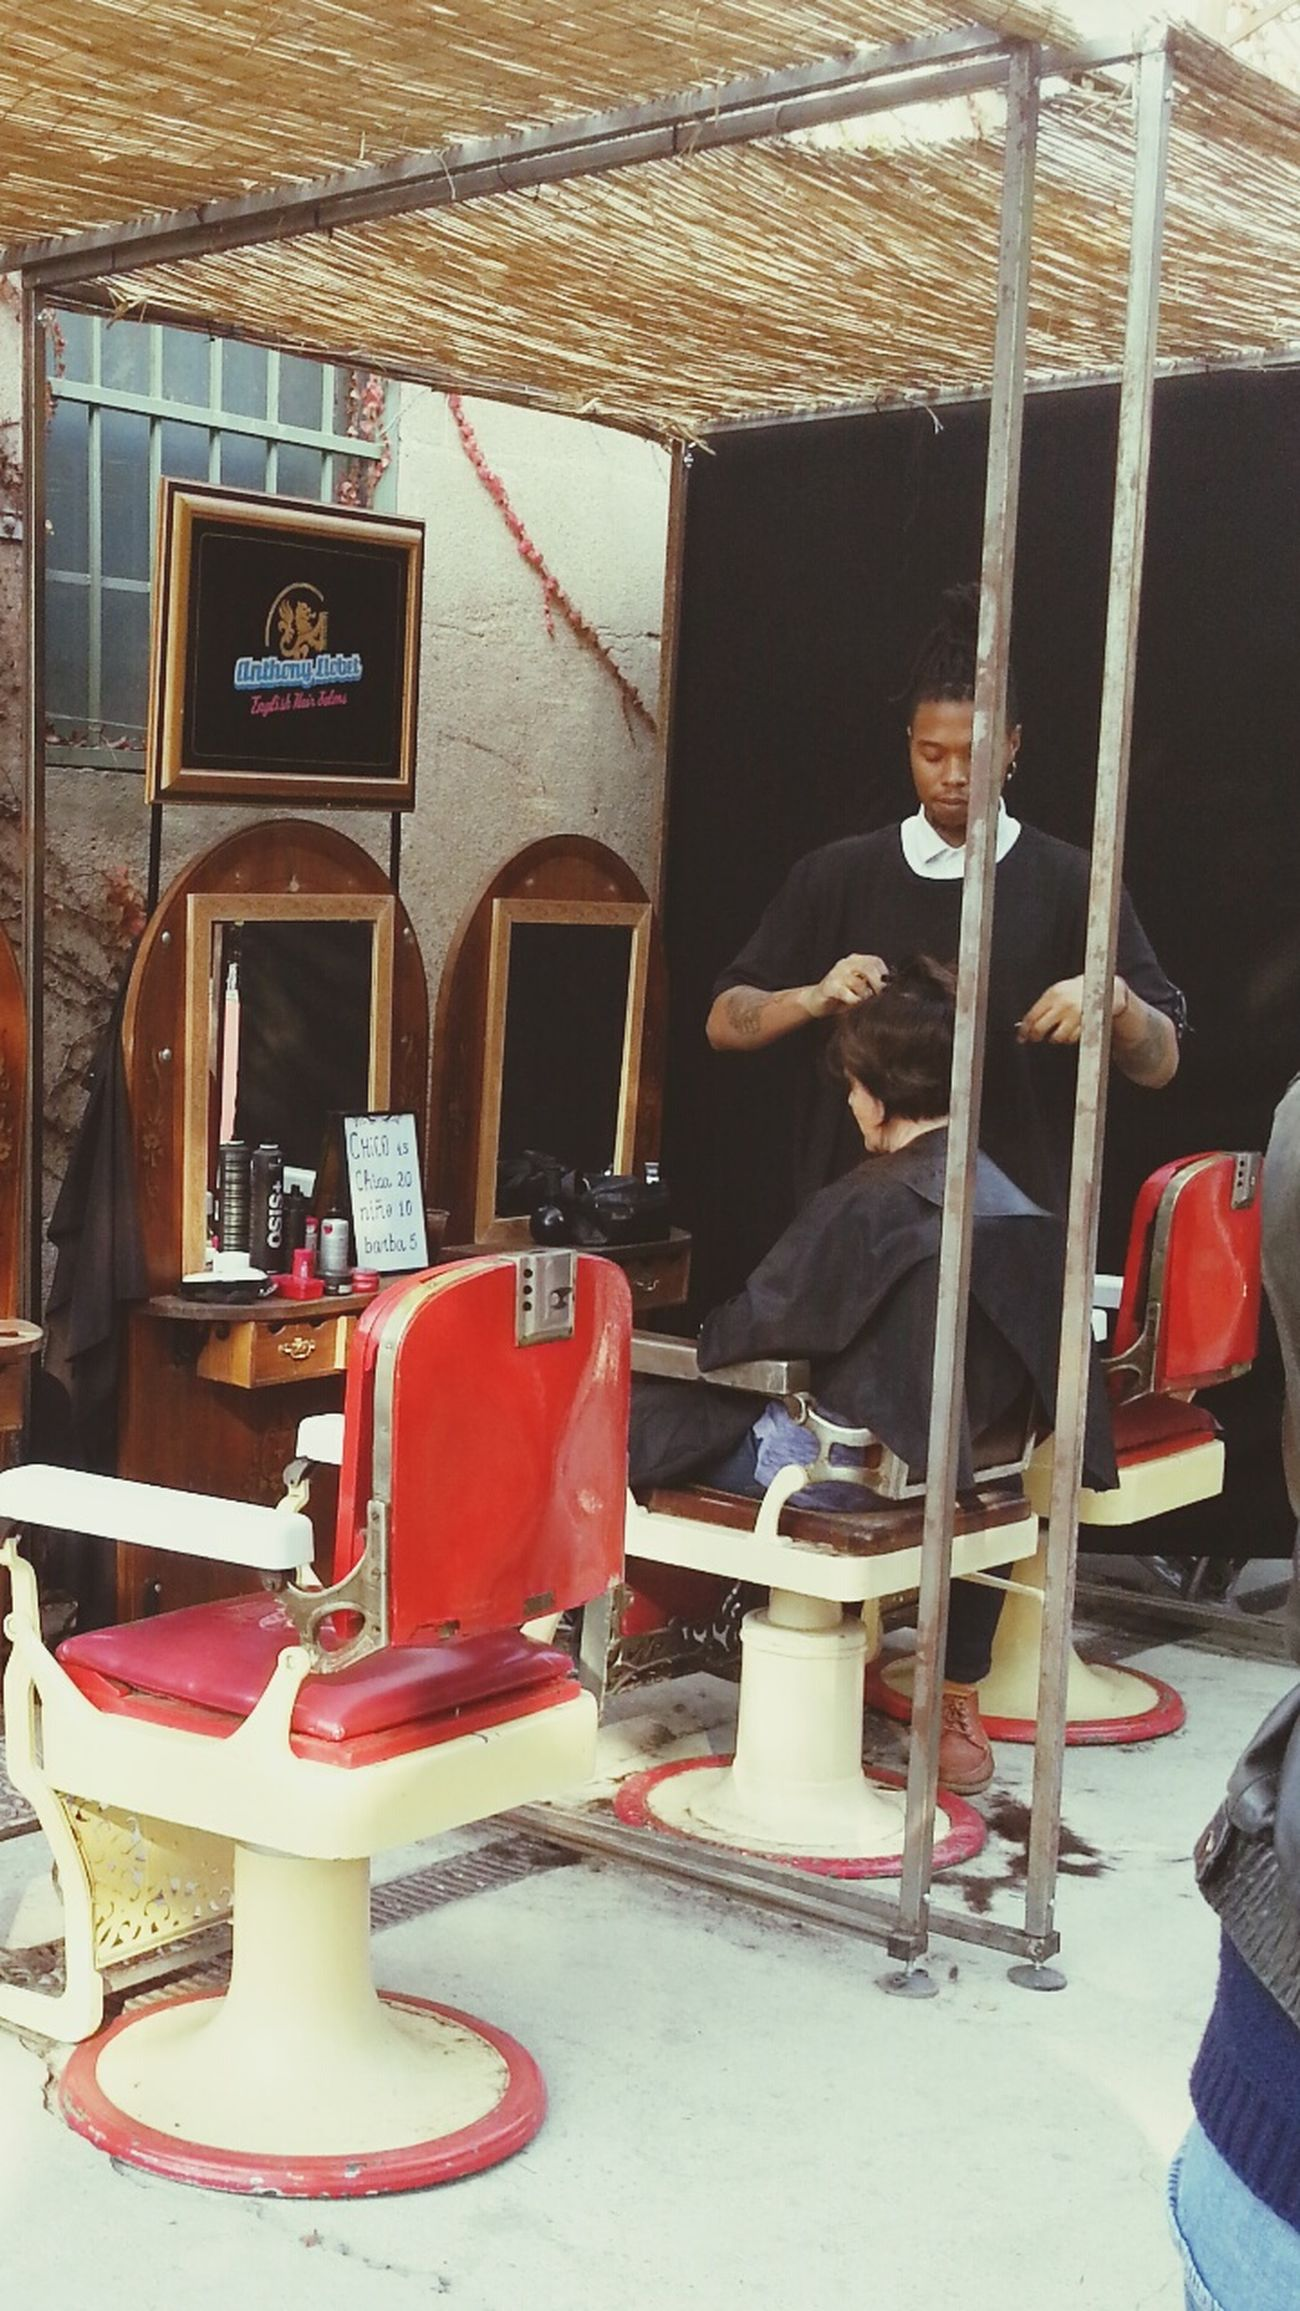 Corte de pelo al aire libre. Haircut Street Photography Paloaltomarket